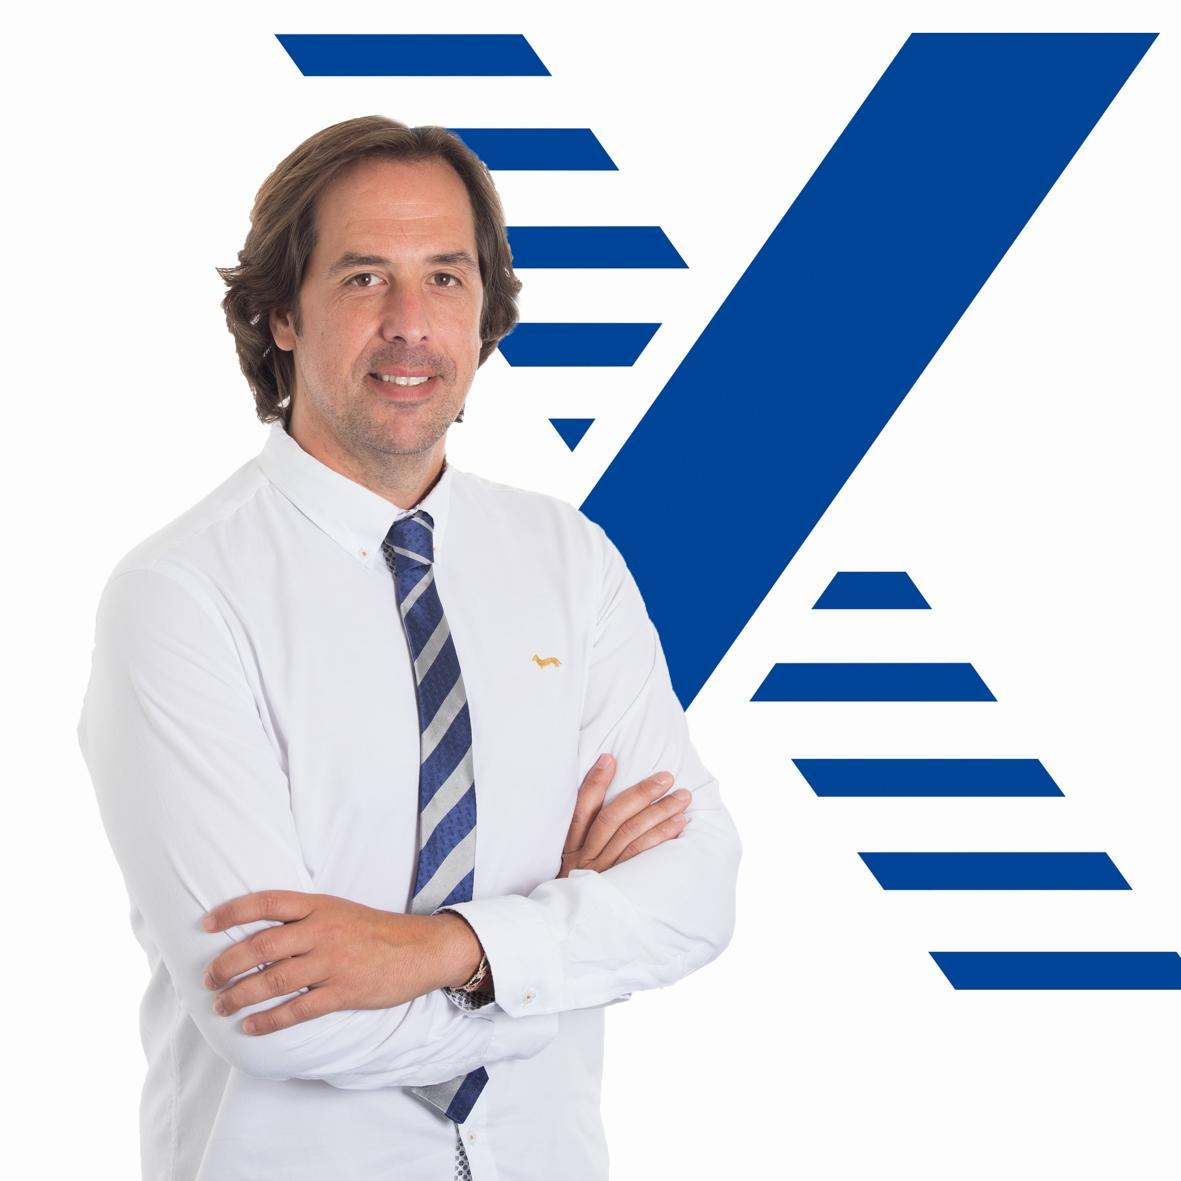 Miguel Aznar